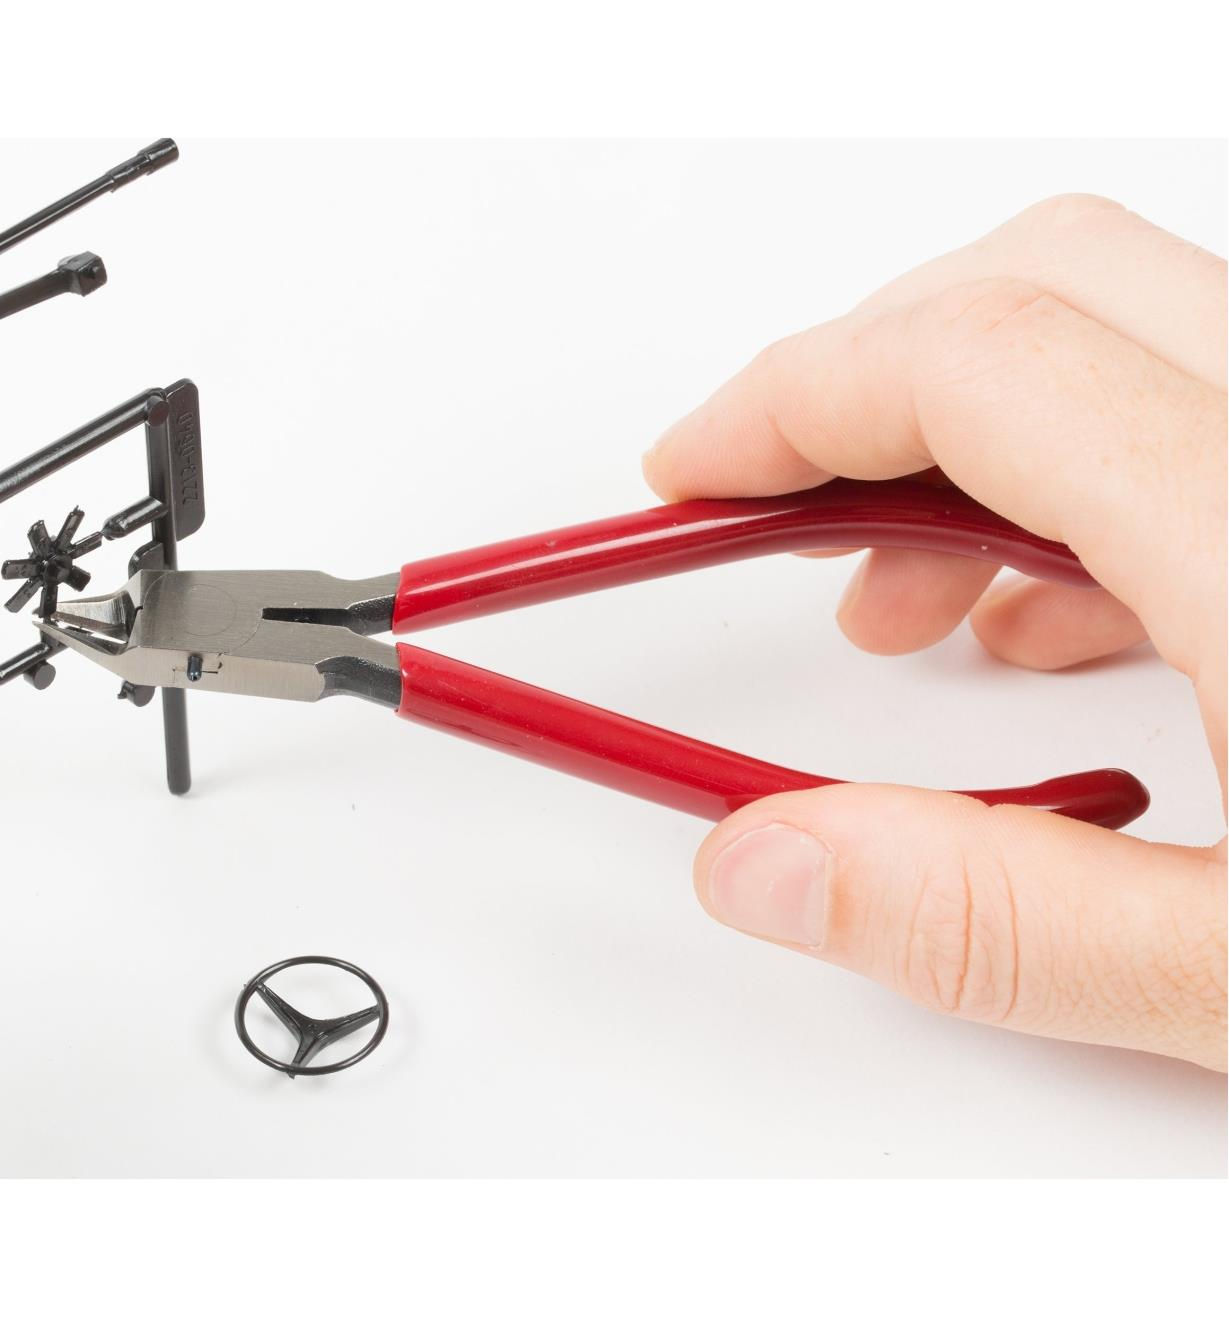 60K2306 - Mini Plastic Snips